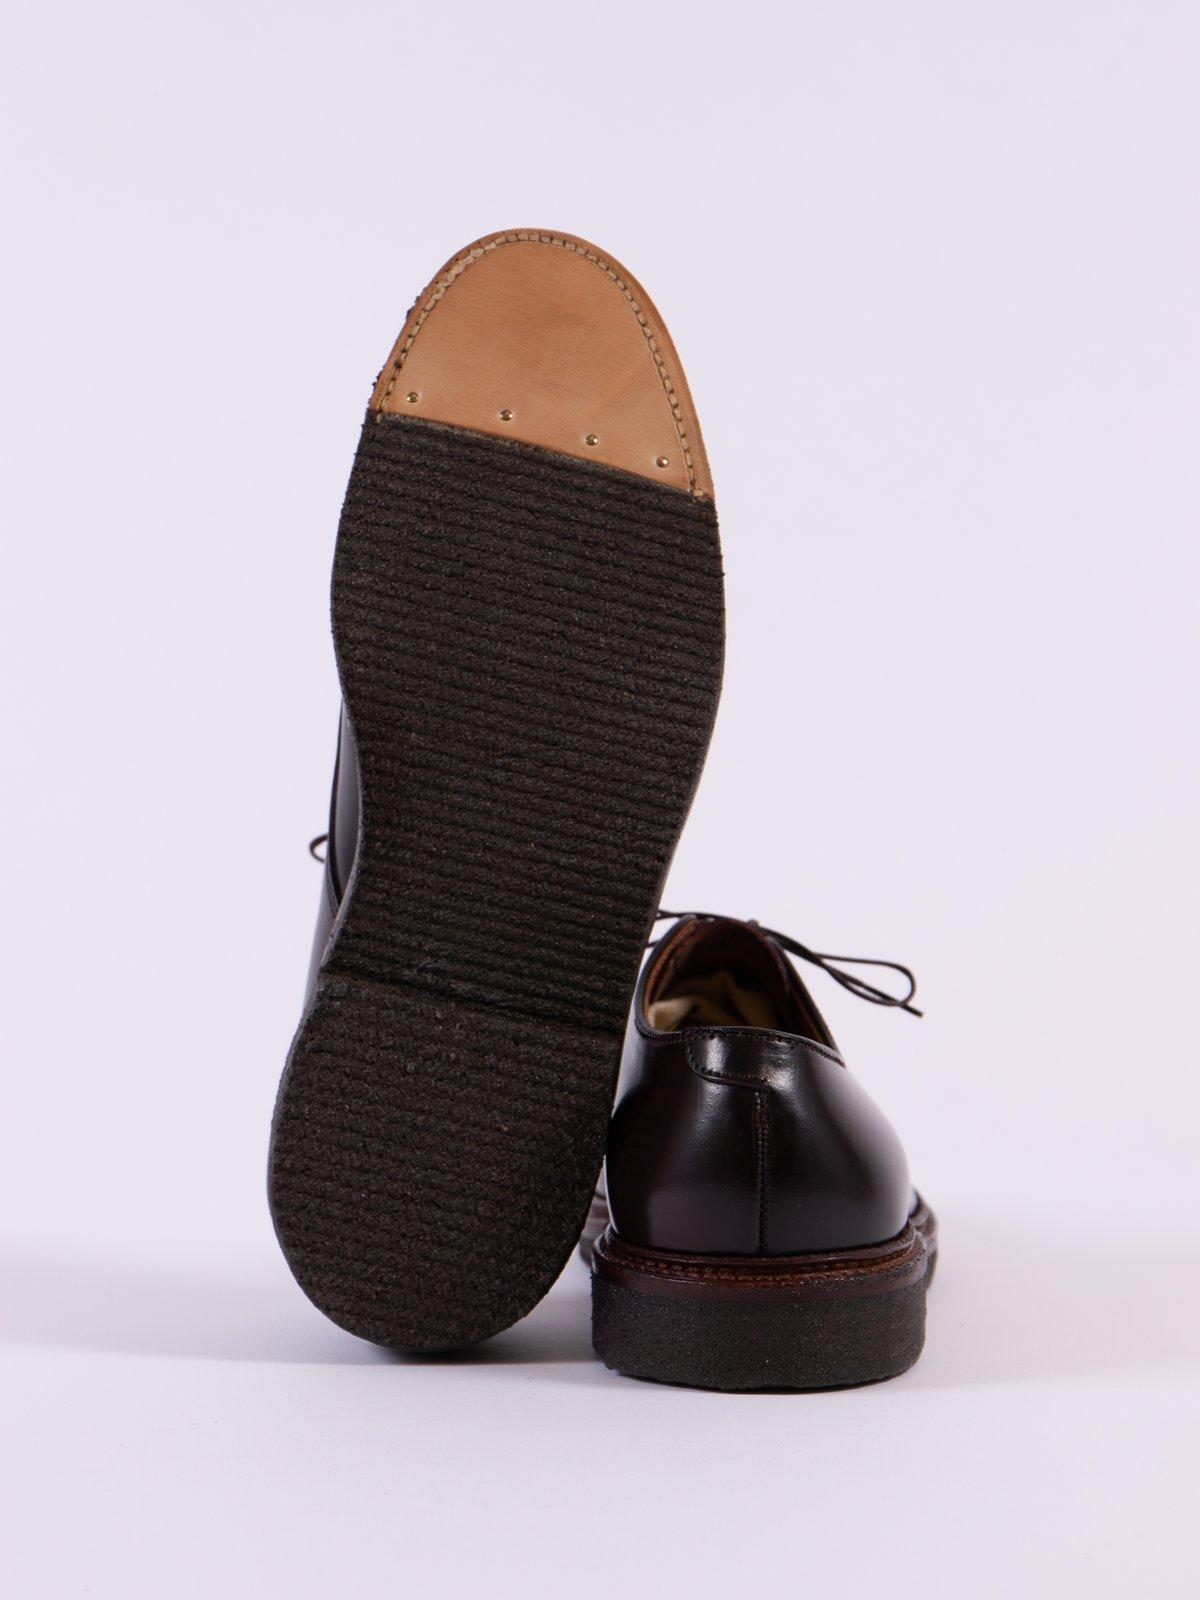 Color 8 Cordovan Plain Toe Blucher with Crepe Sole - Image 5